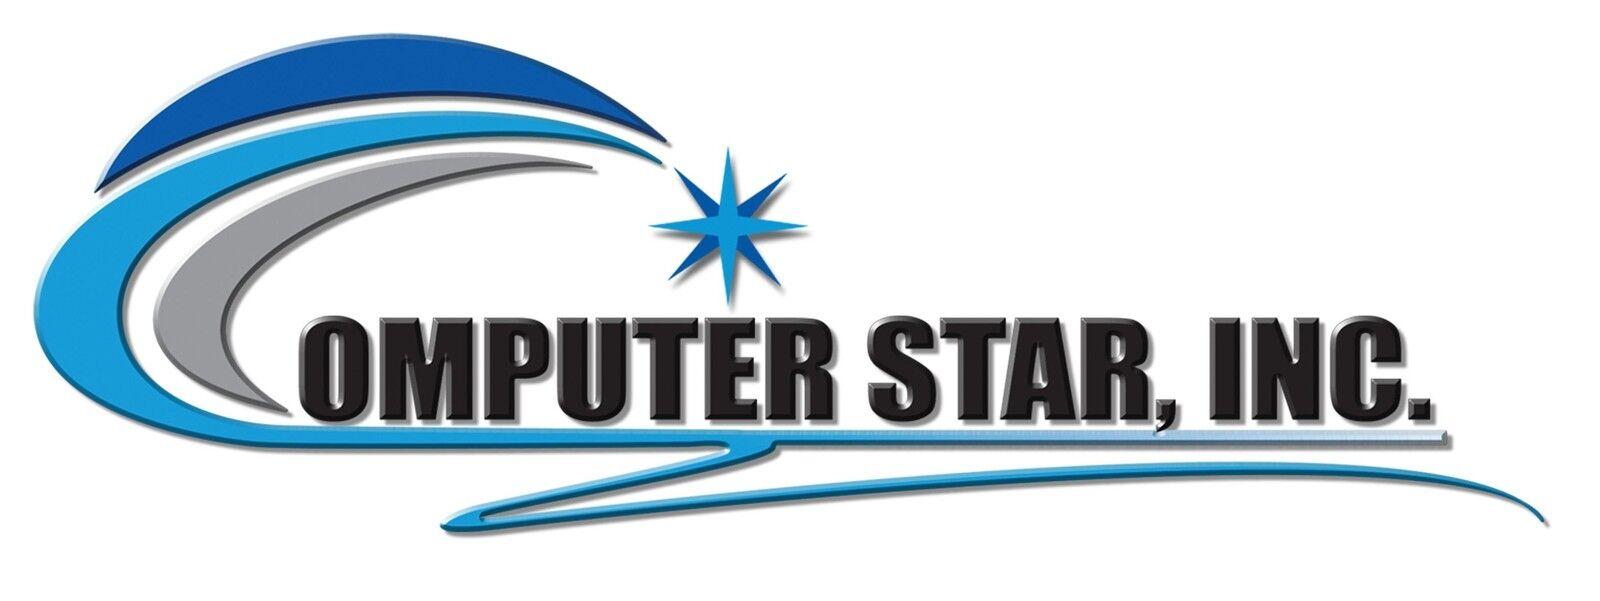 Computer Star Inc